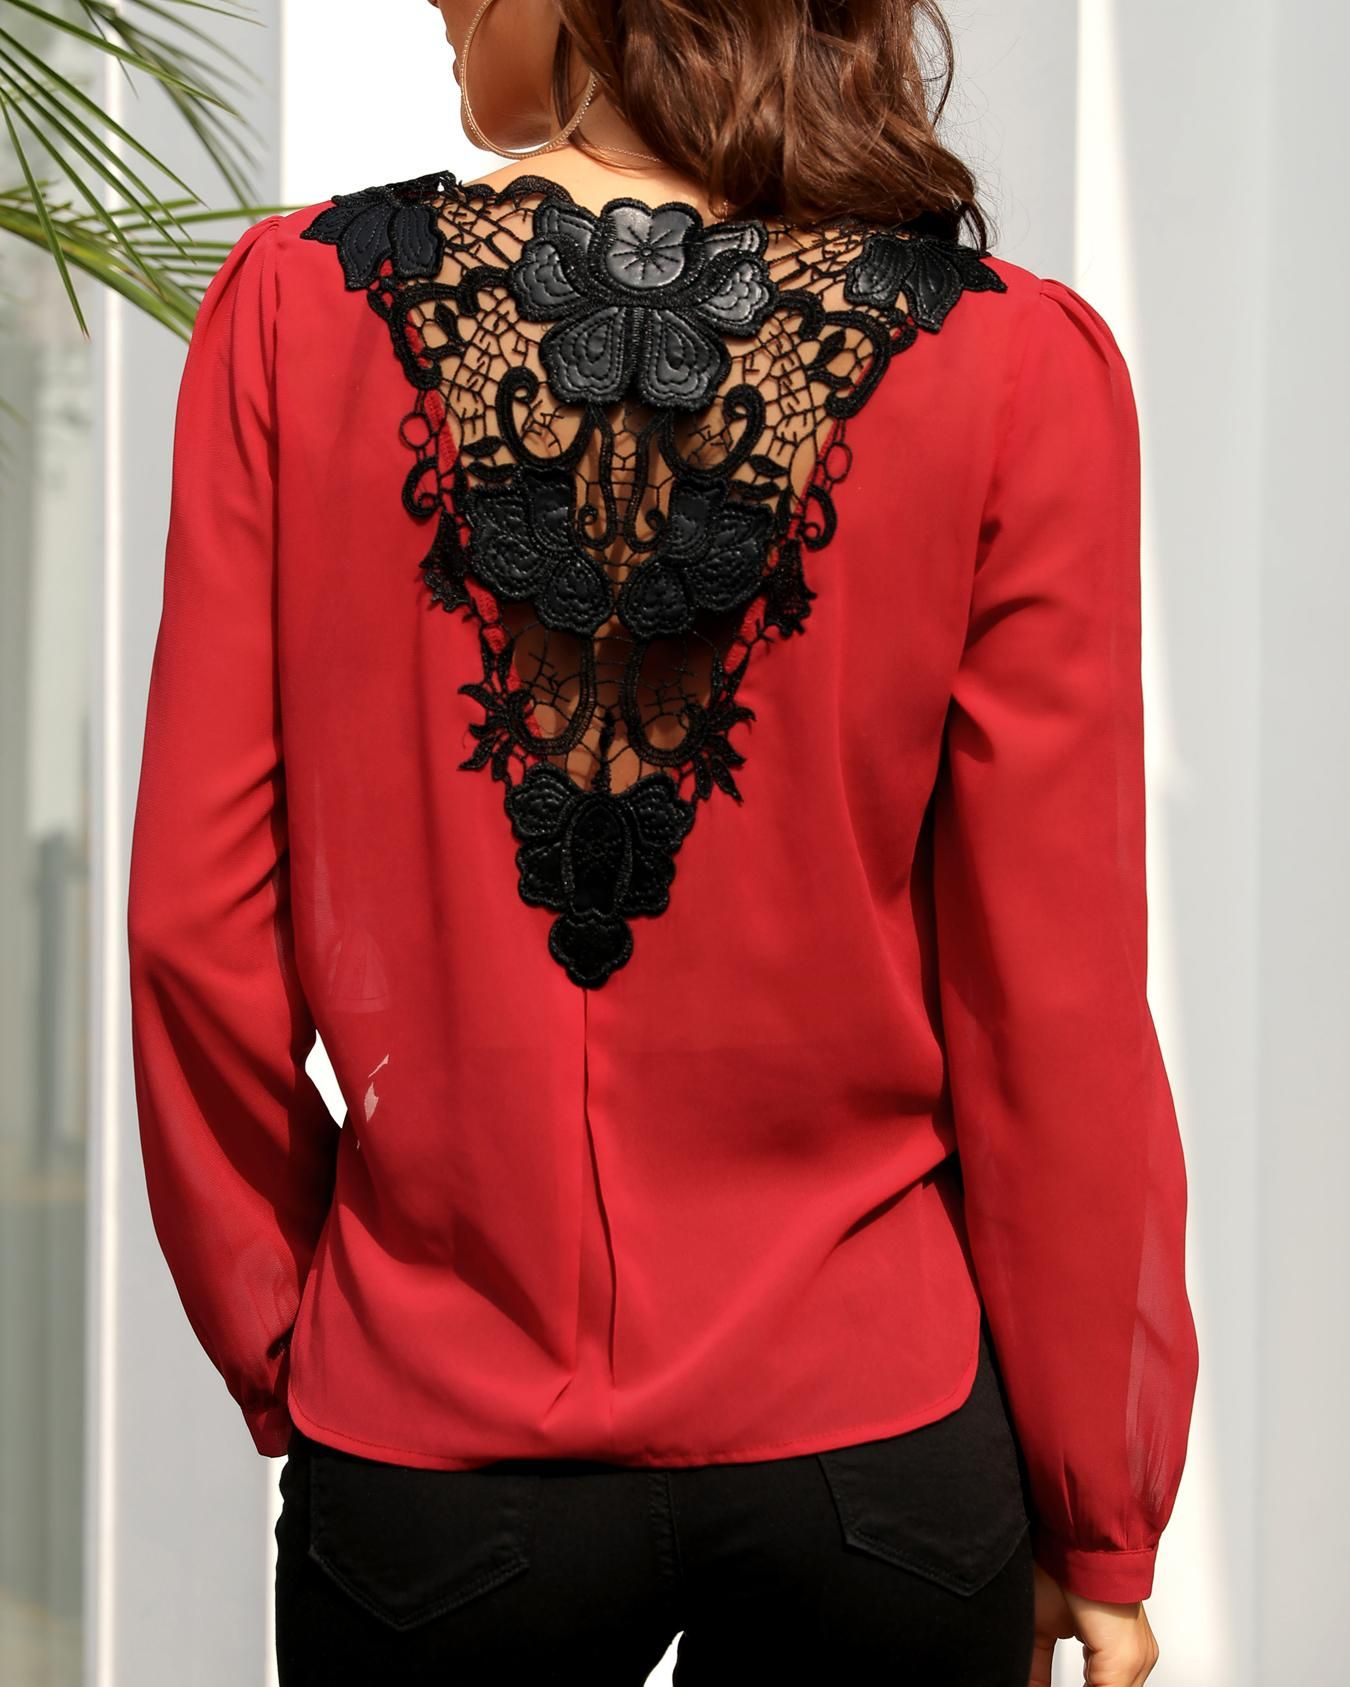 Lace Crochet Back Surplice Front Blouse Fashion Dip Hem Blouse Pattern Fashion